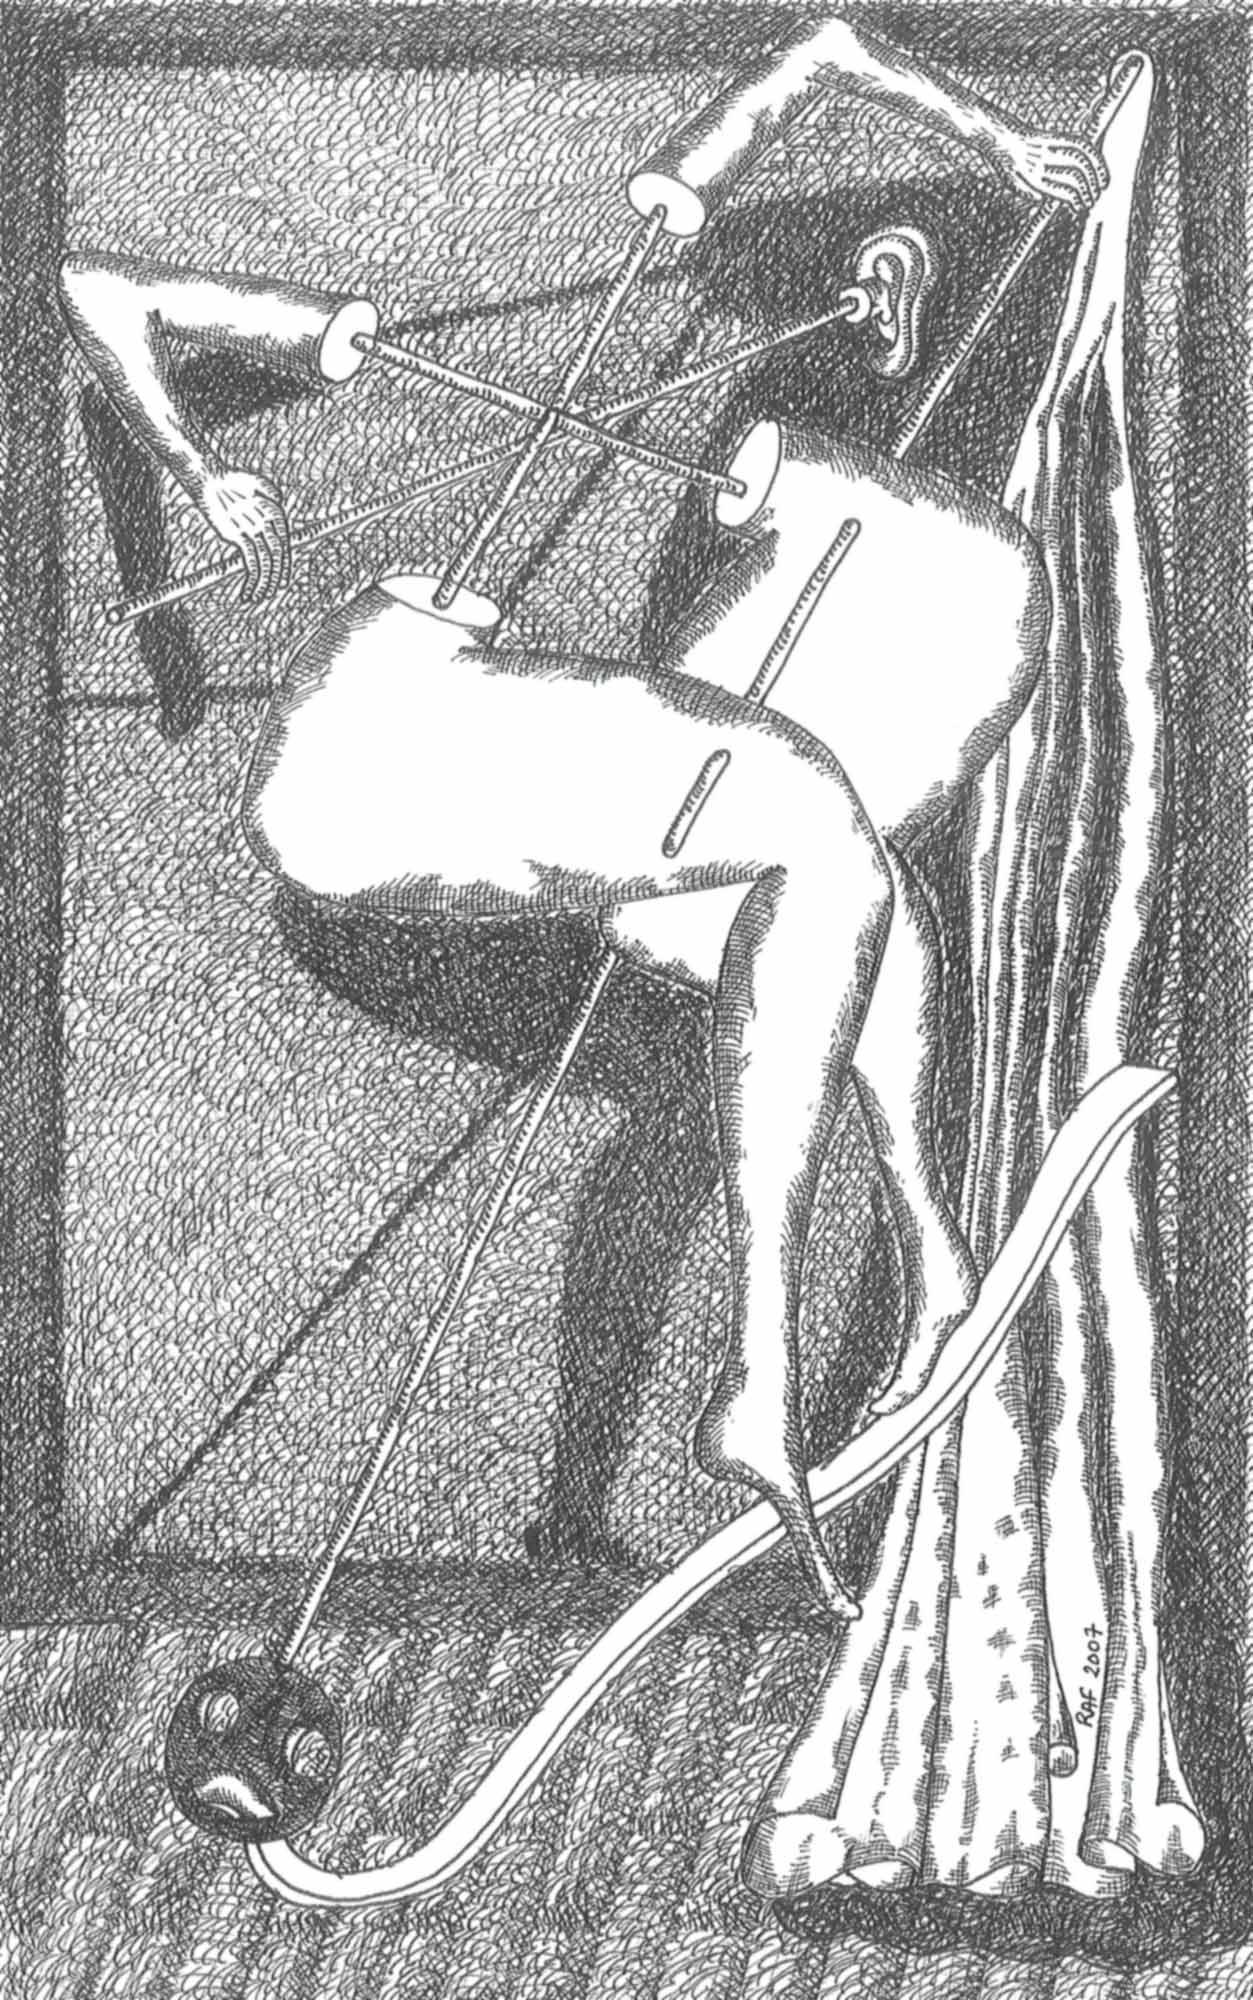 Pantomime, dessin, Raf Listowski, 2007